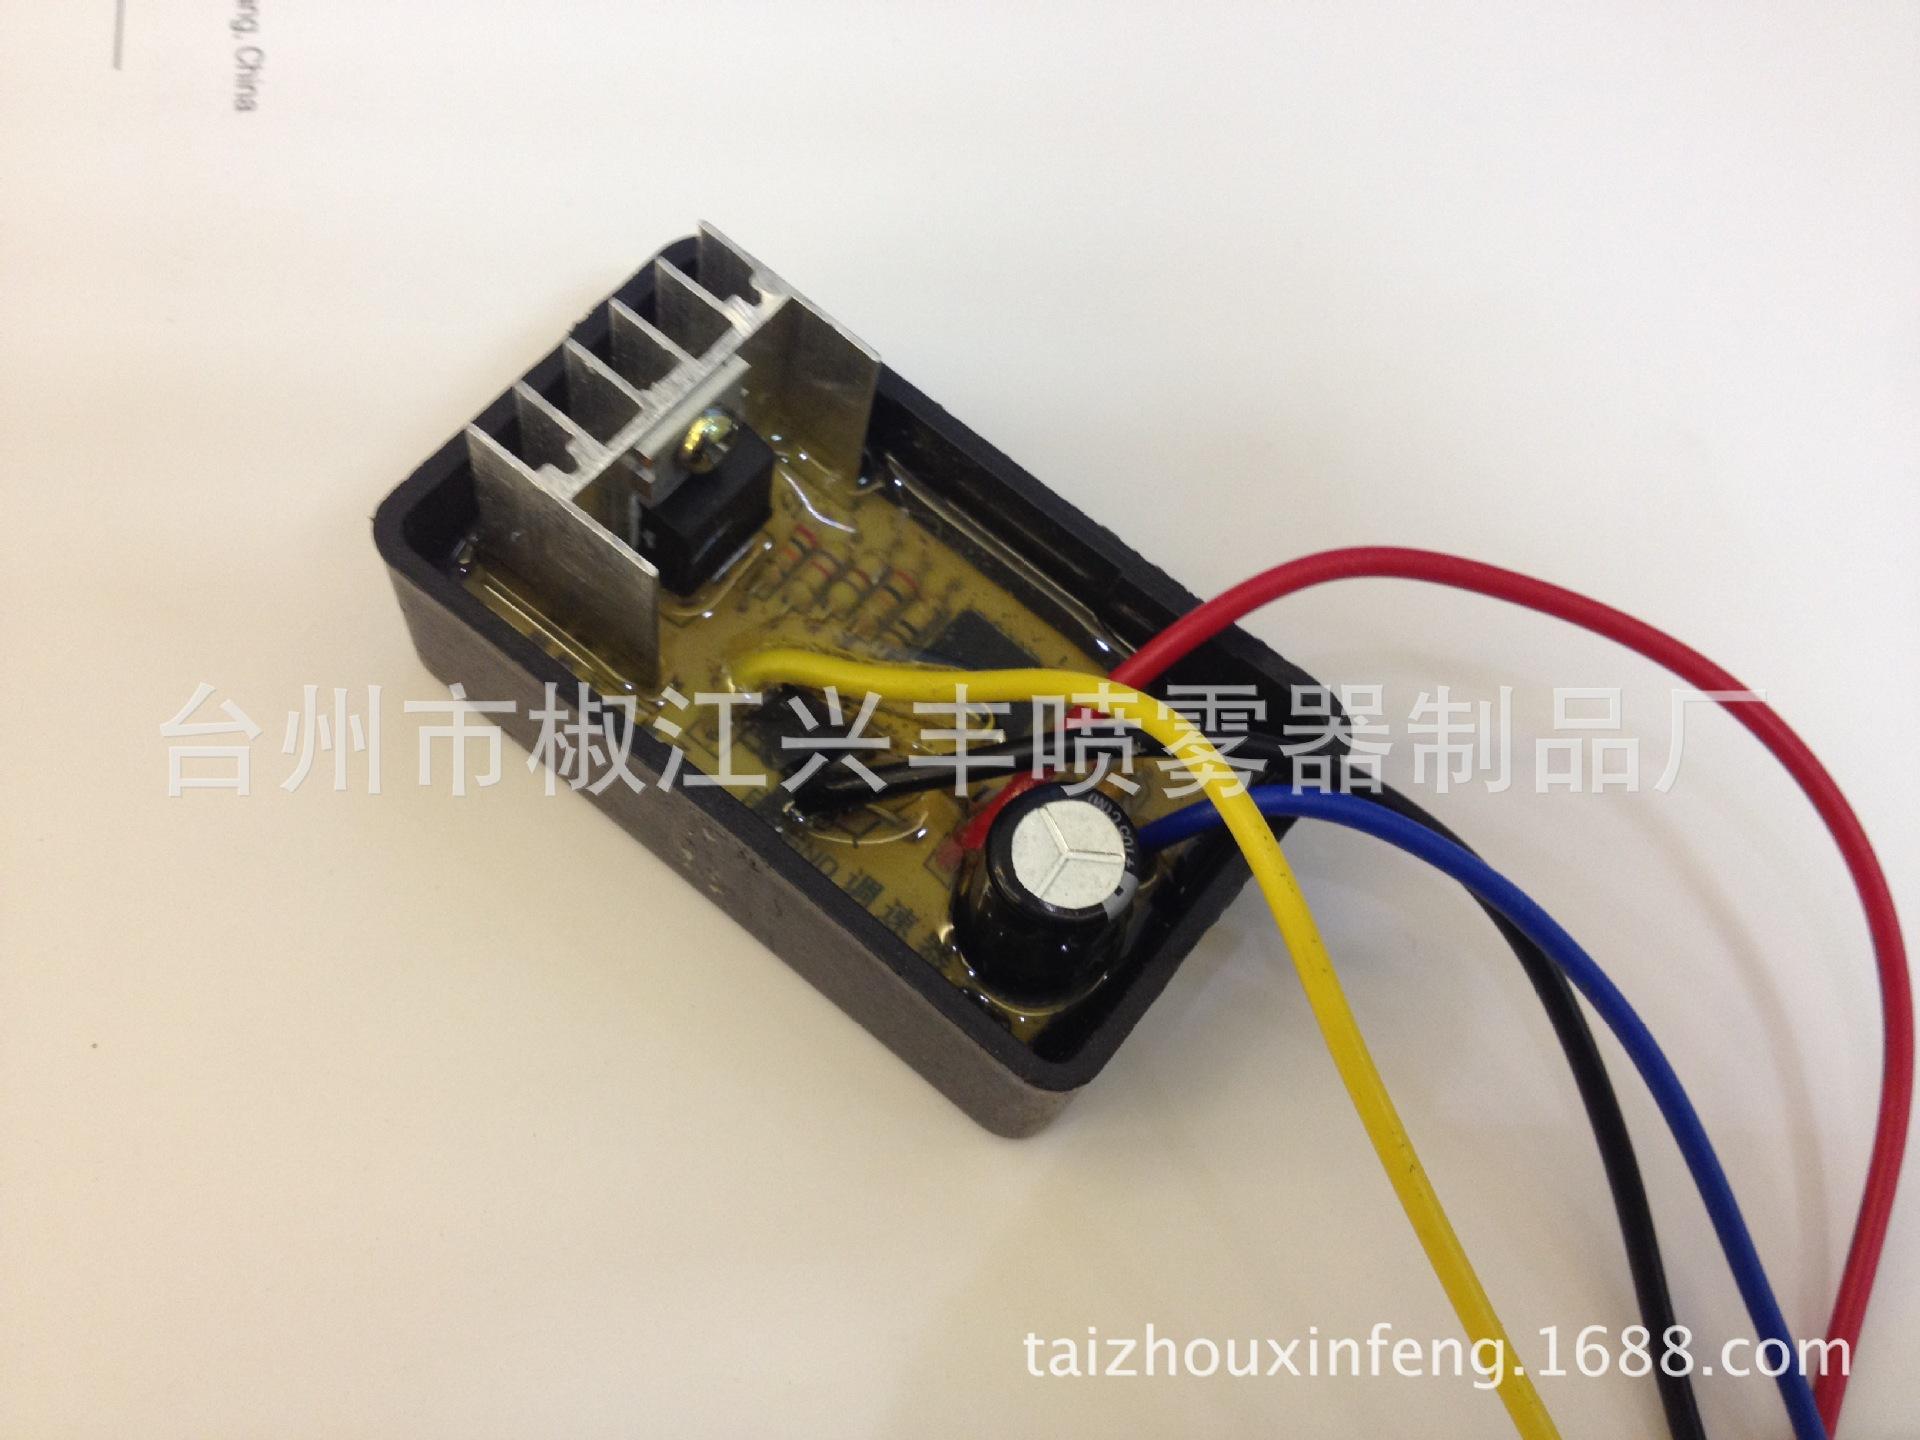 Q 02 分体调速器 12V大电瓶调速器 电动喷雾器调速器 -价格,厂图片